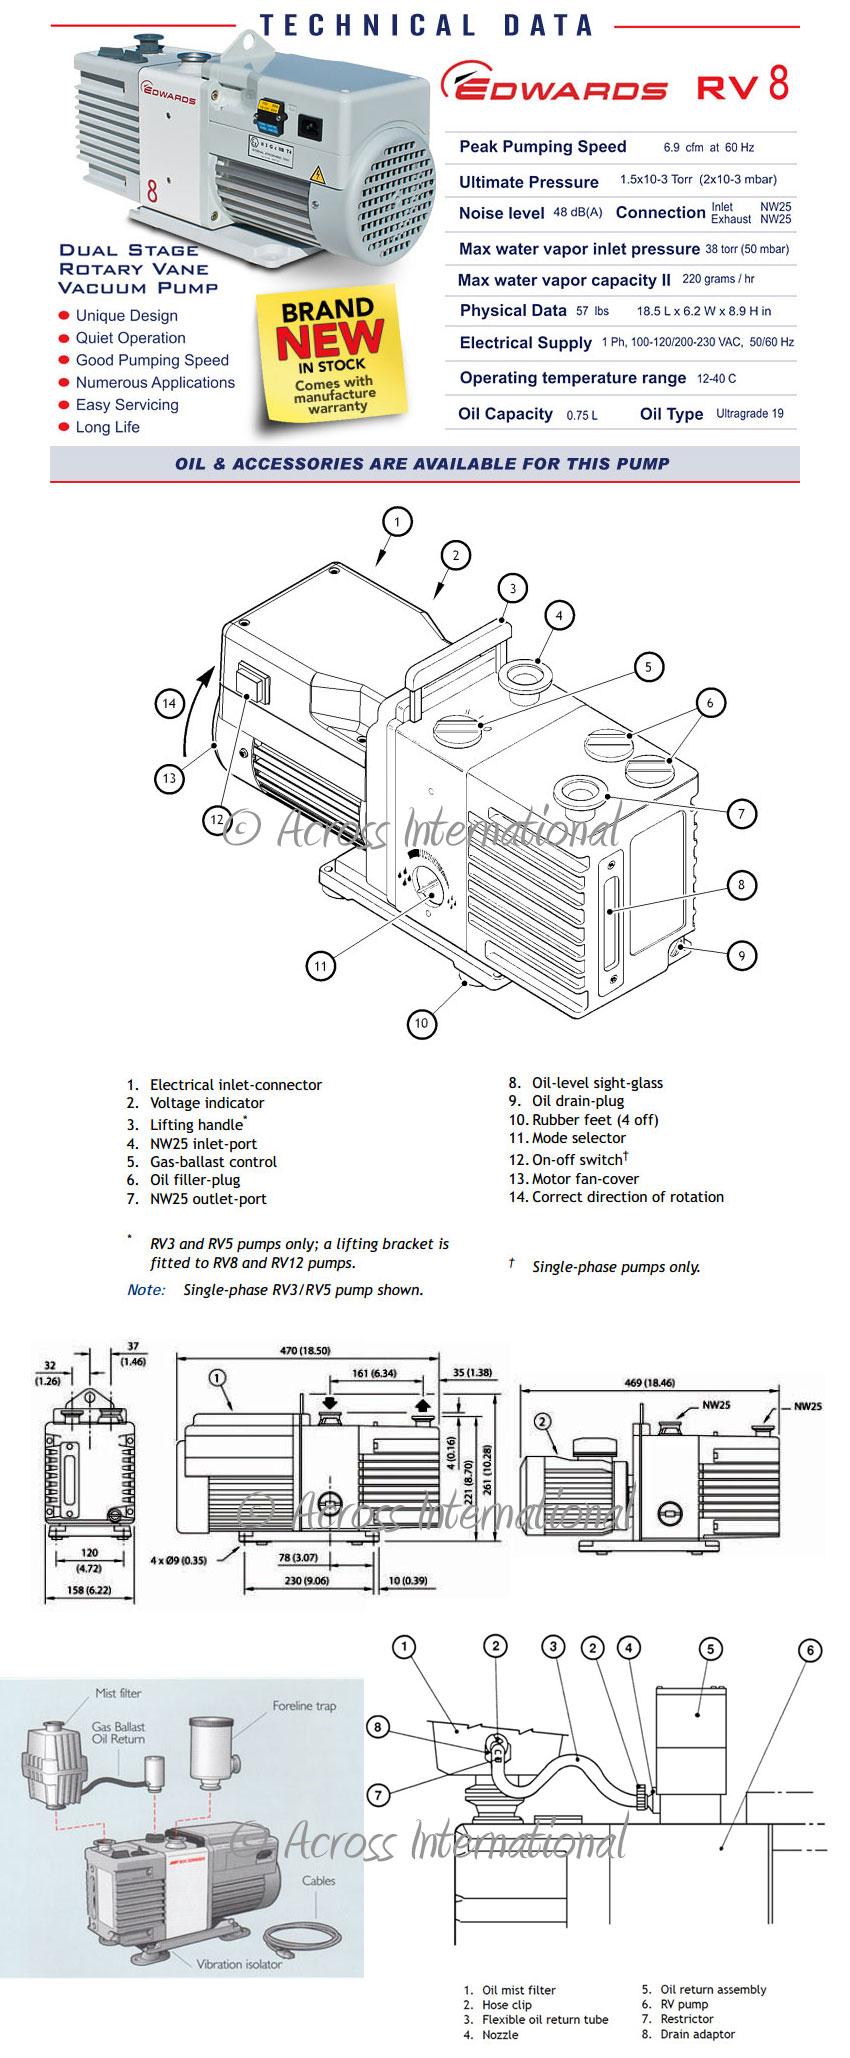 Edwards RV28 6 9 CFM Dual Stage High Capacity Vacuum Pump